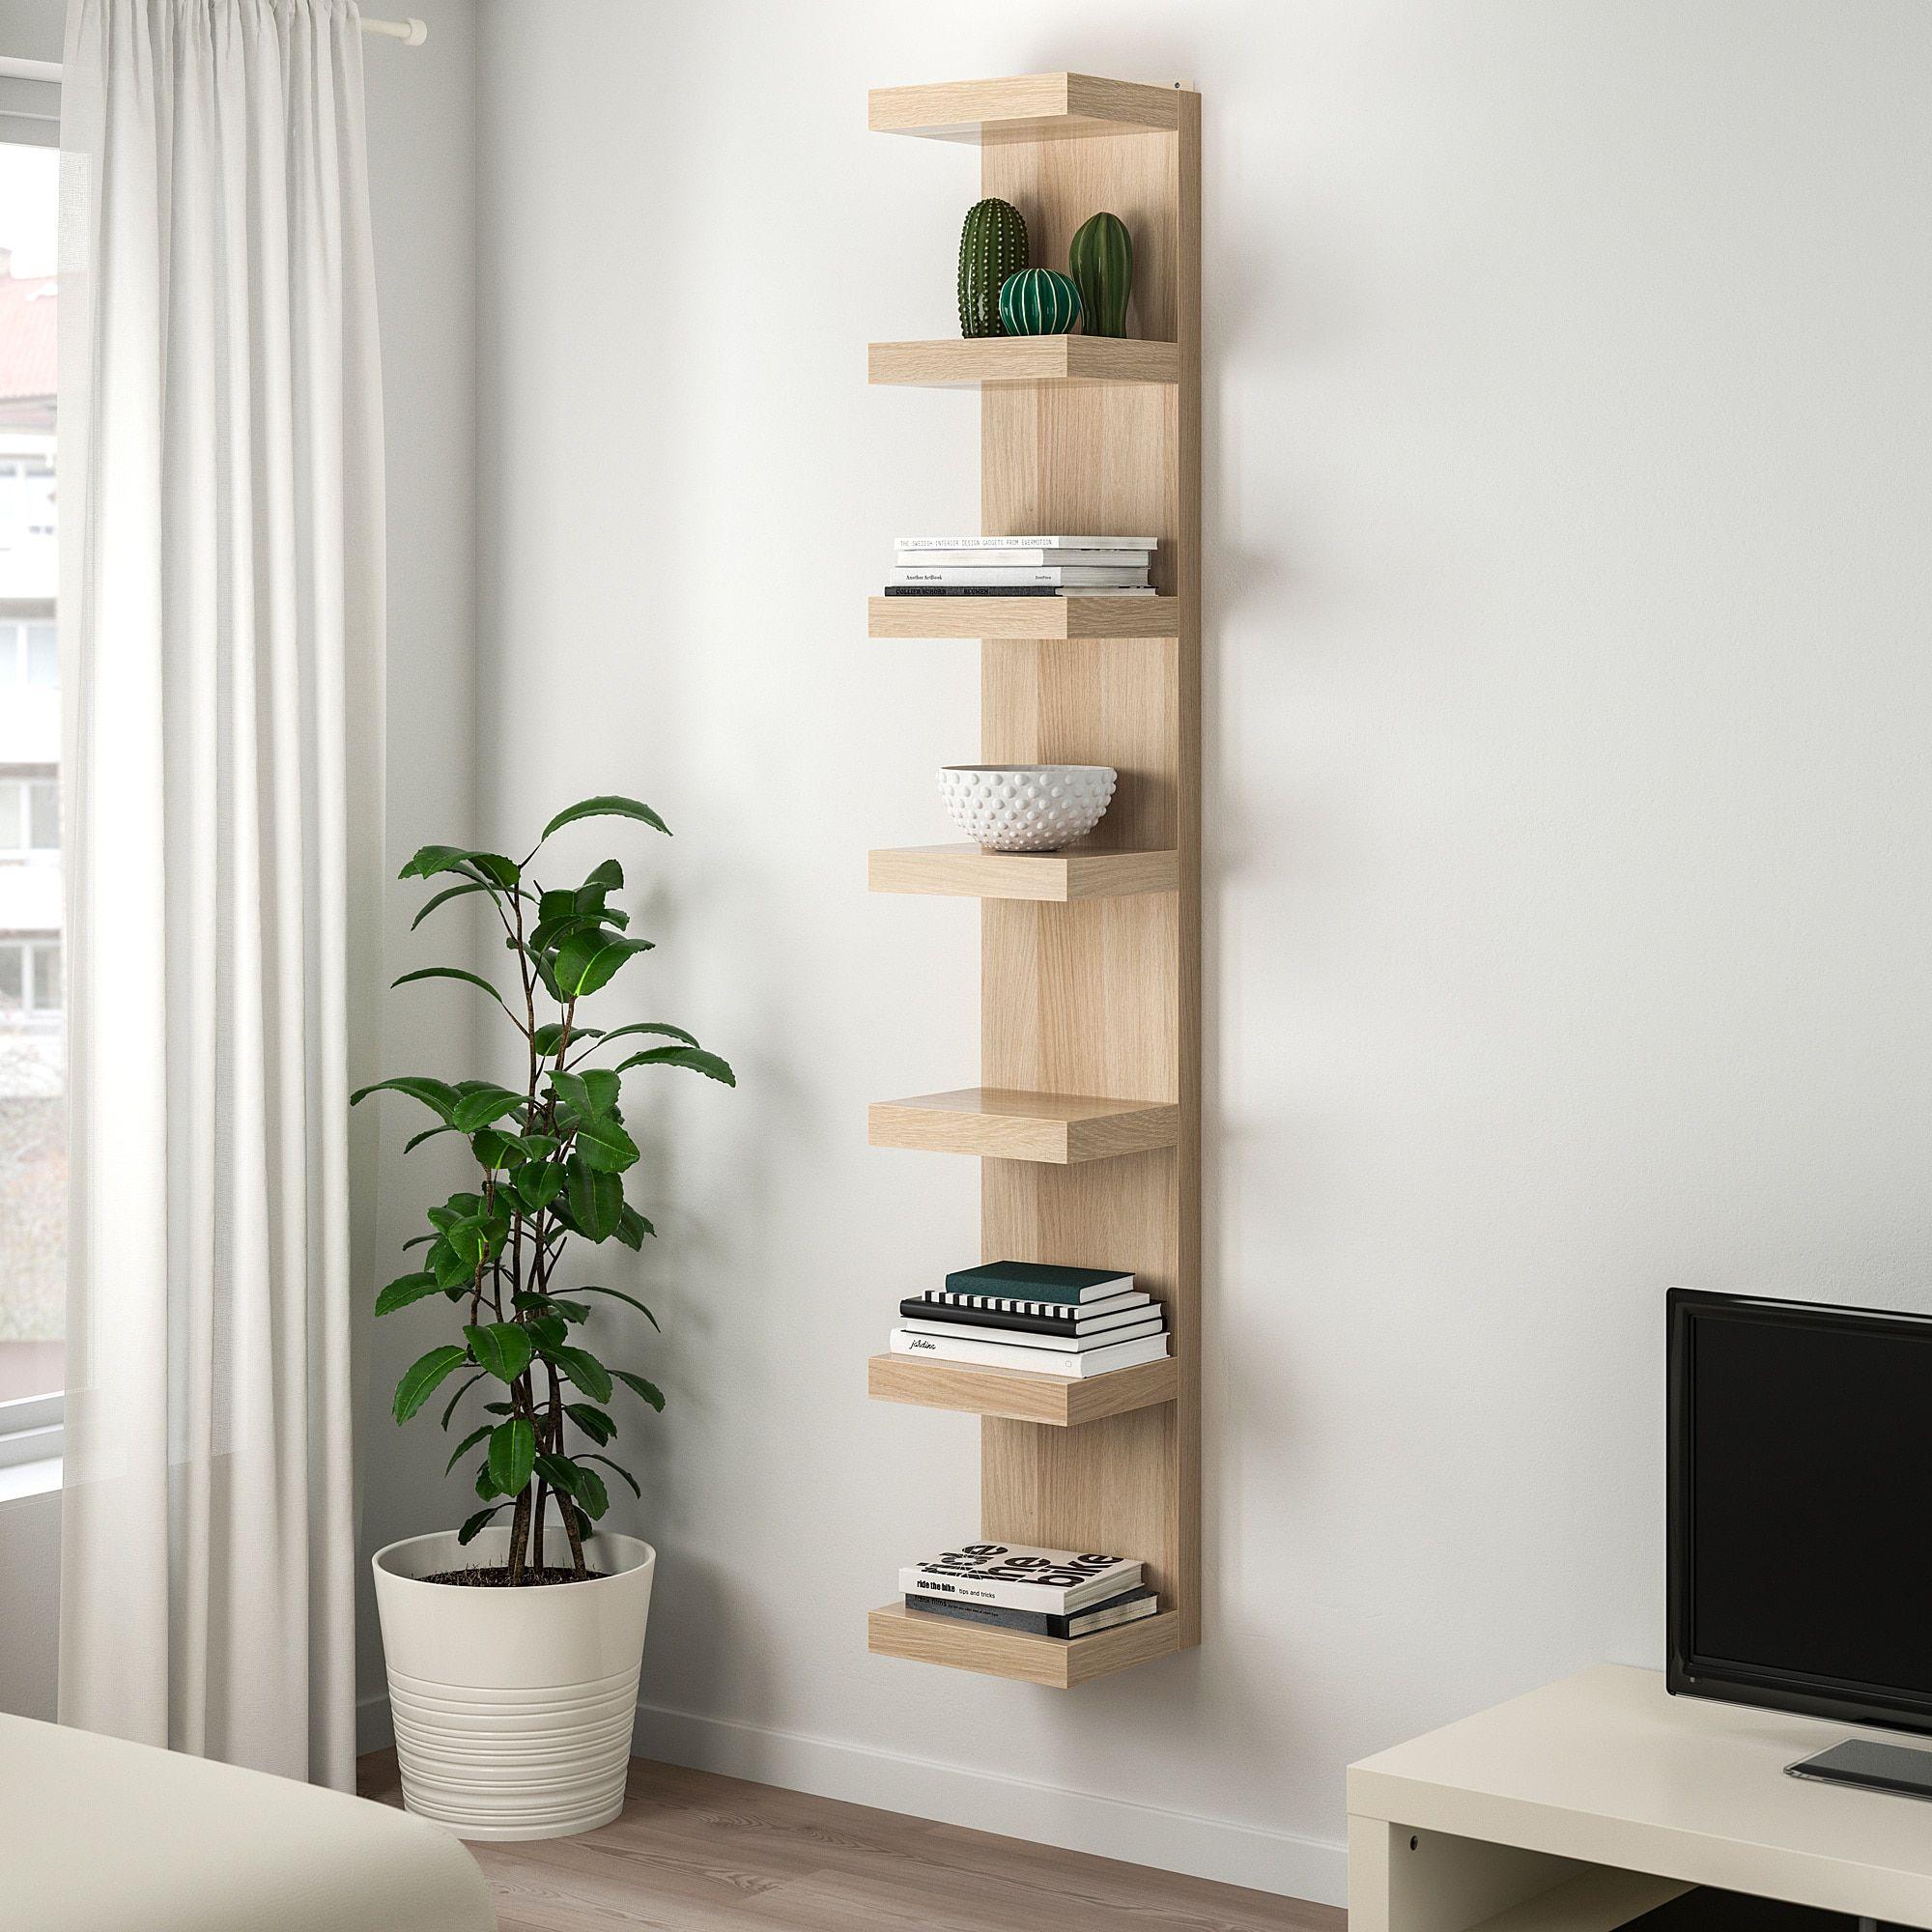 Lack Wall Shelf Unit White Stained Oak Effect Ikea Ikea Lack Wall Shelf Wall Shelf Unit Ikea Lack Shelves